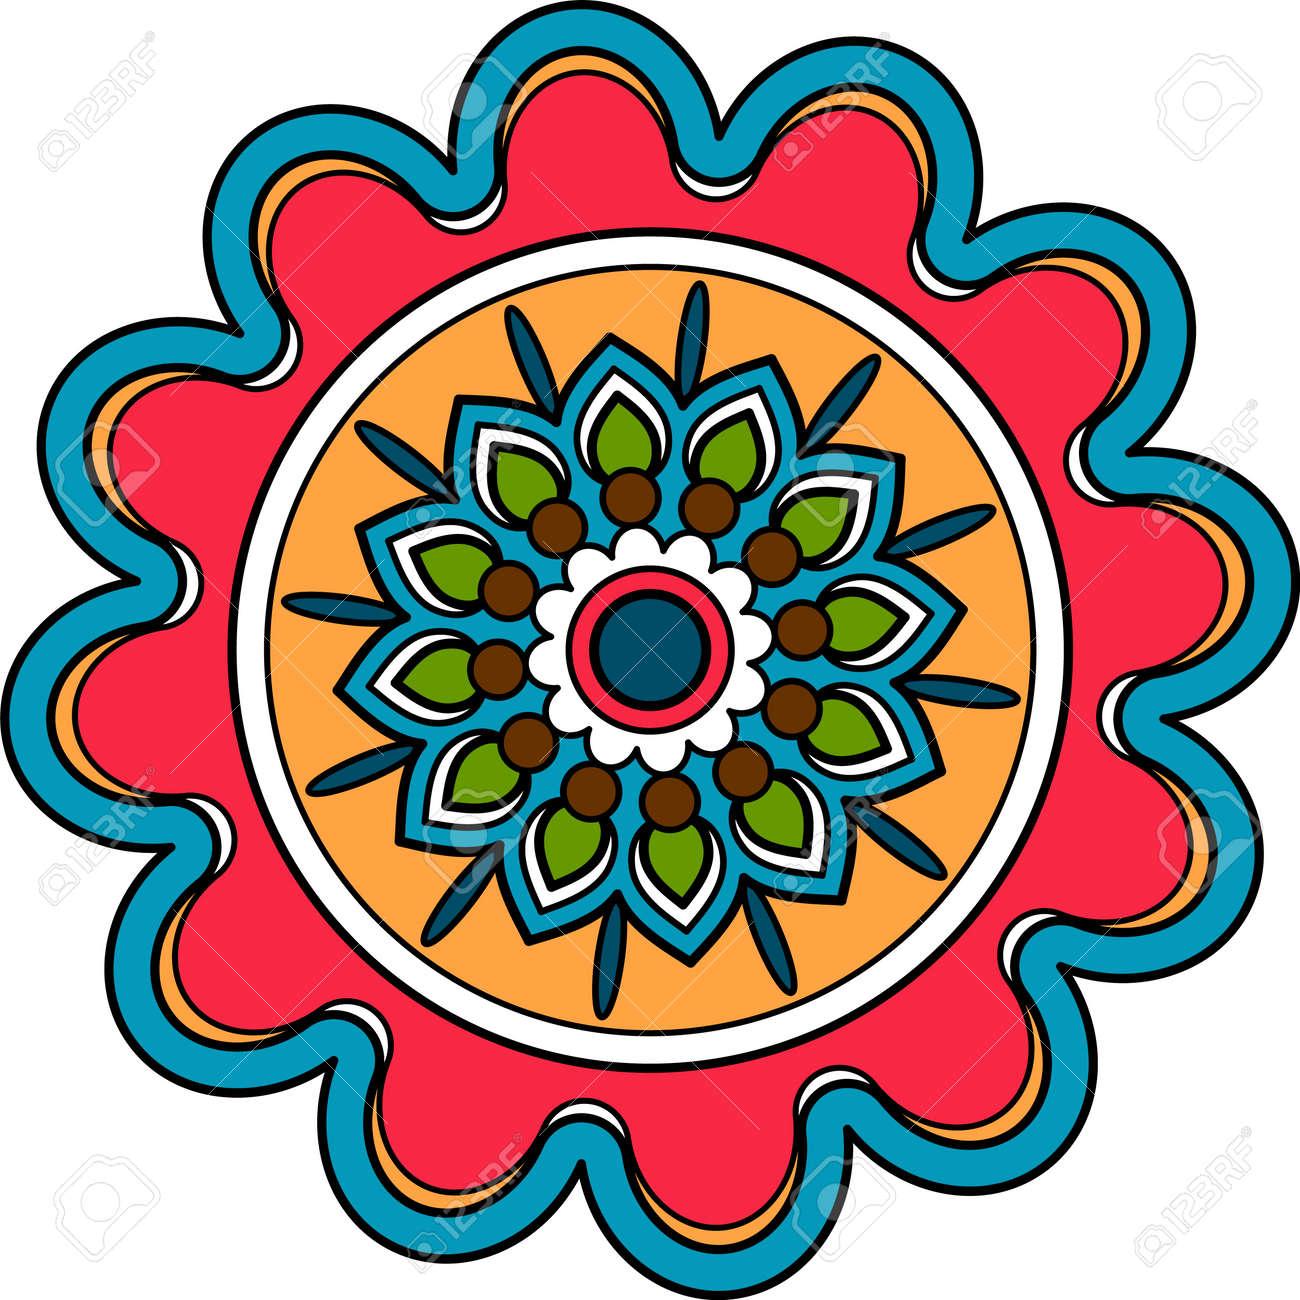 Circular decorative floral element arab round medallion - 170995204